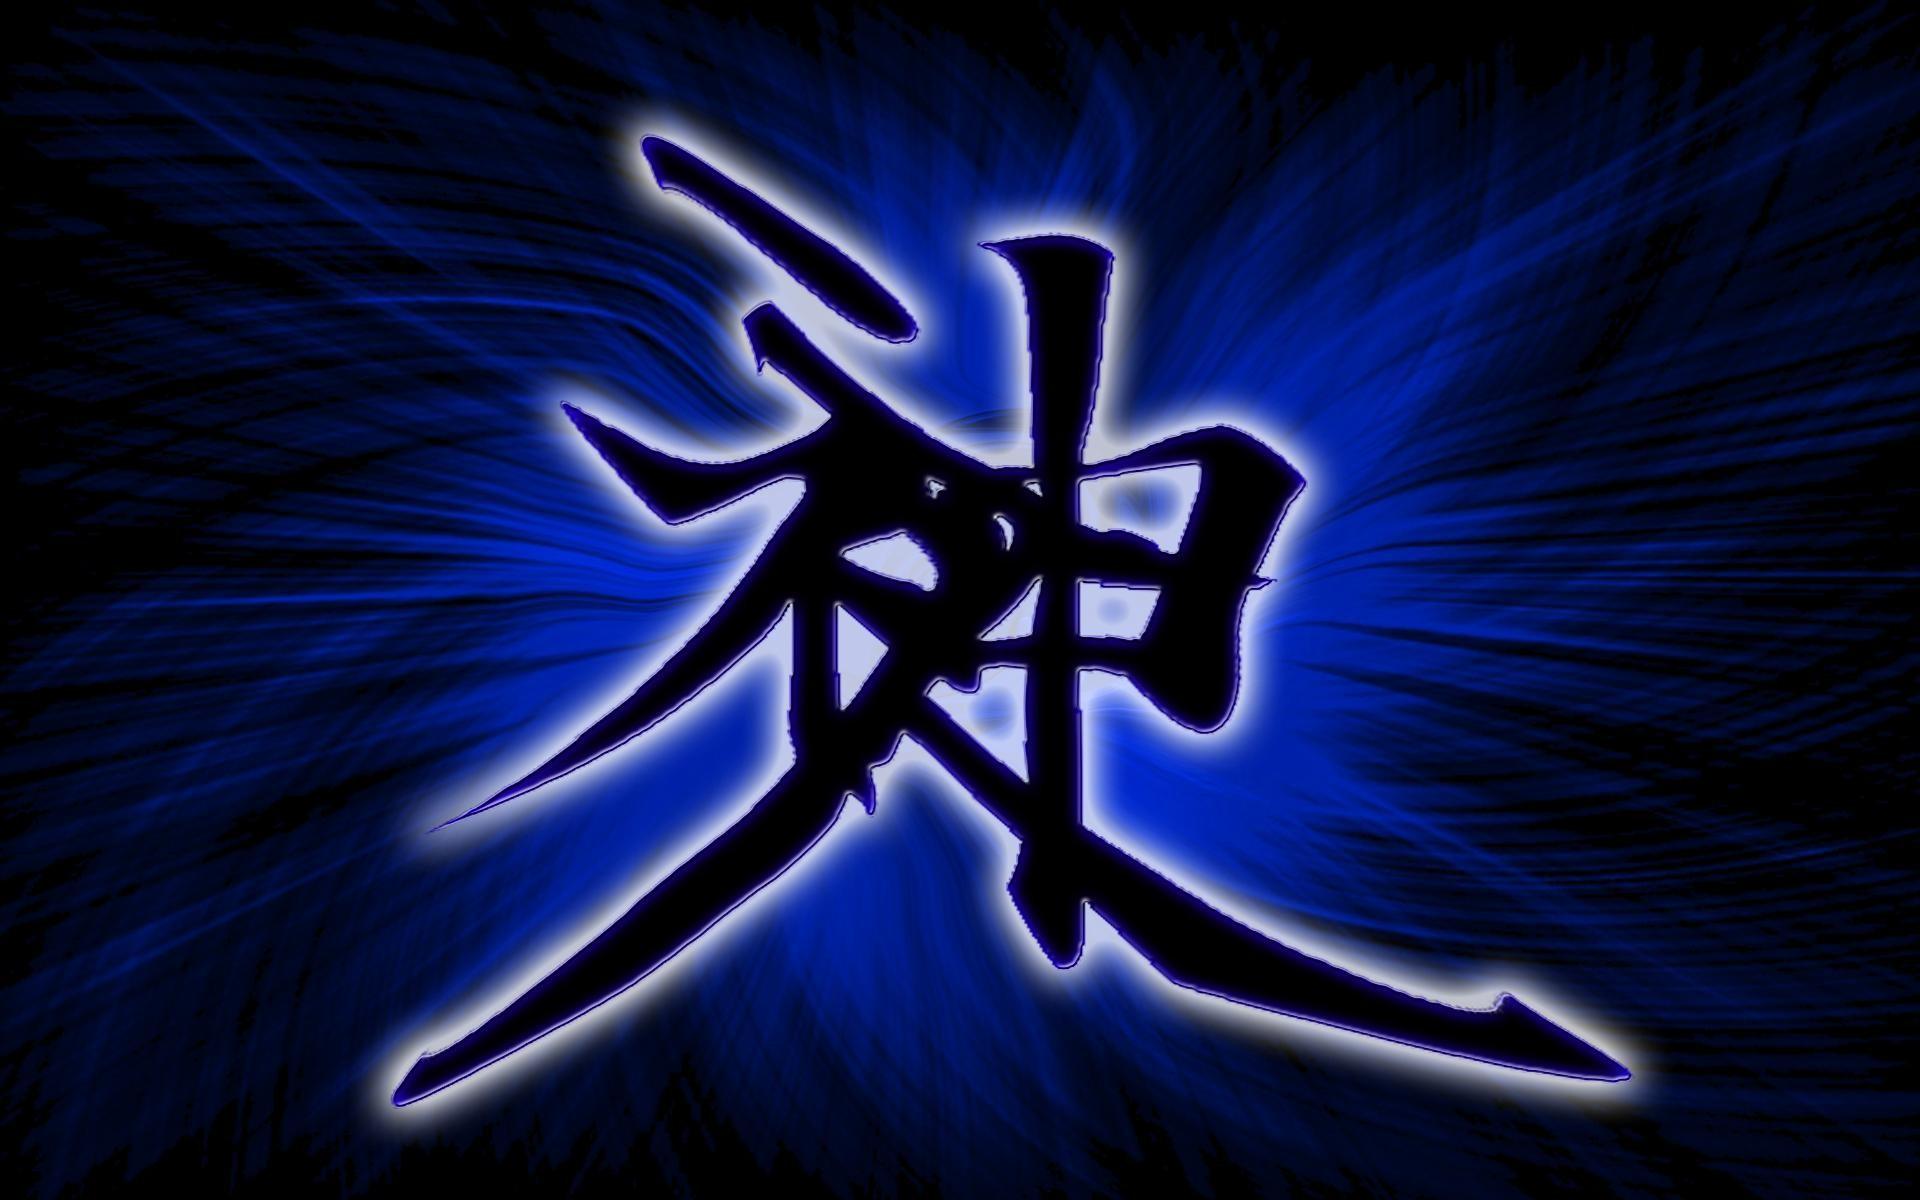 Shin Akuma Wallpaper 69 Images